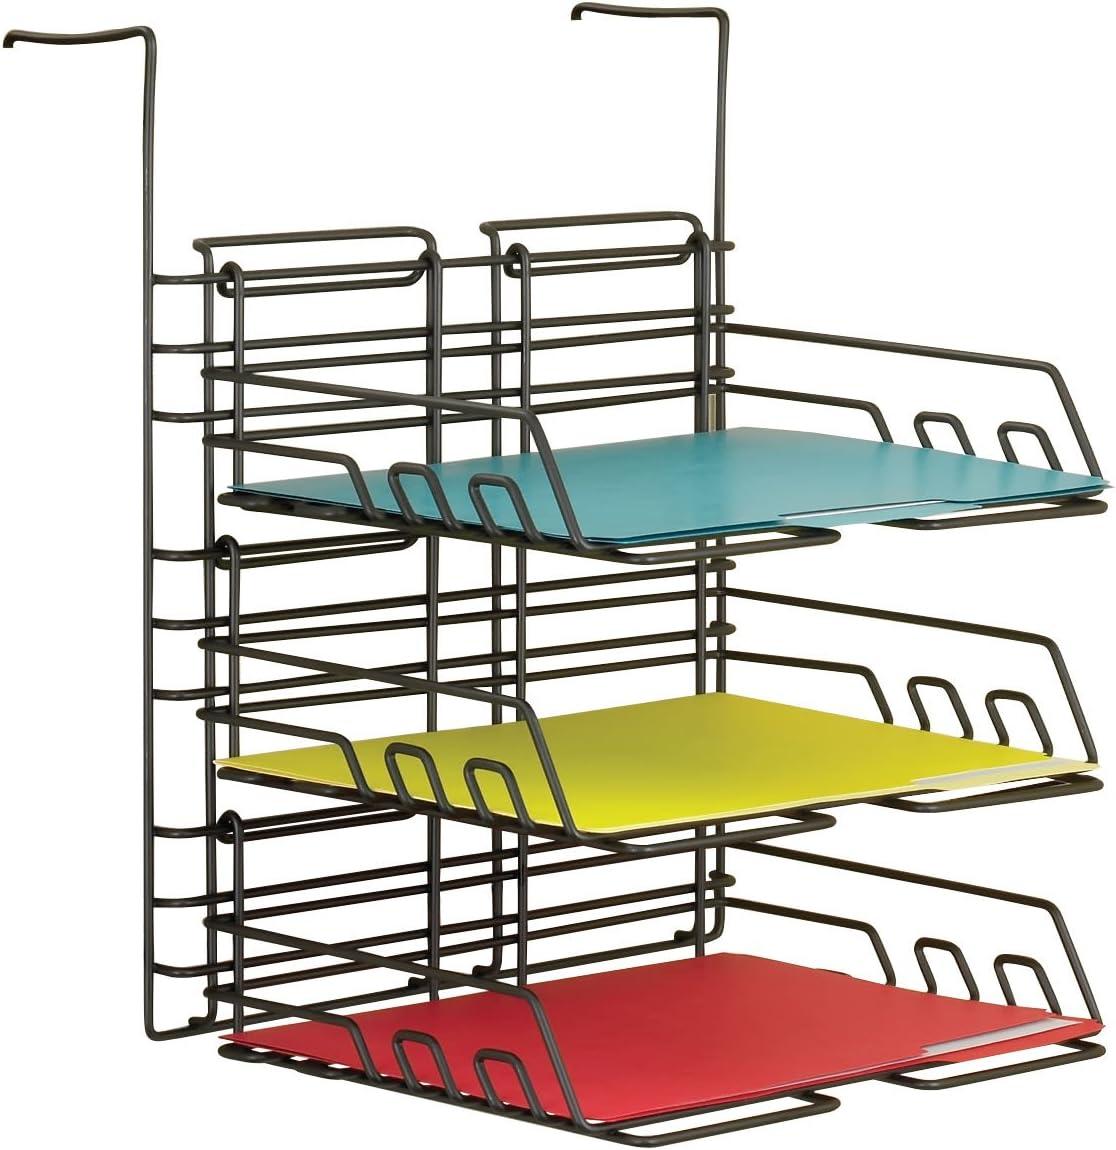 Panelmate triple-tray Organizer ( Set of 6 ) [ Set of 6 ]